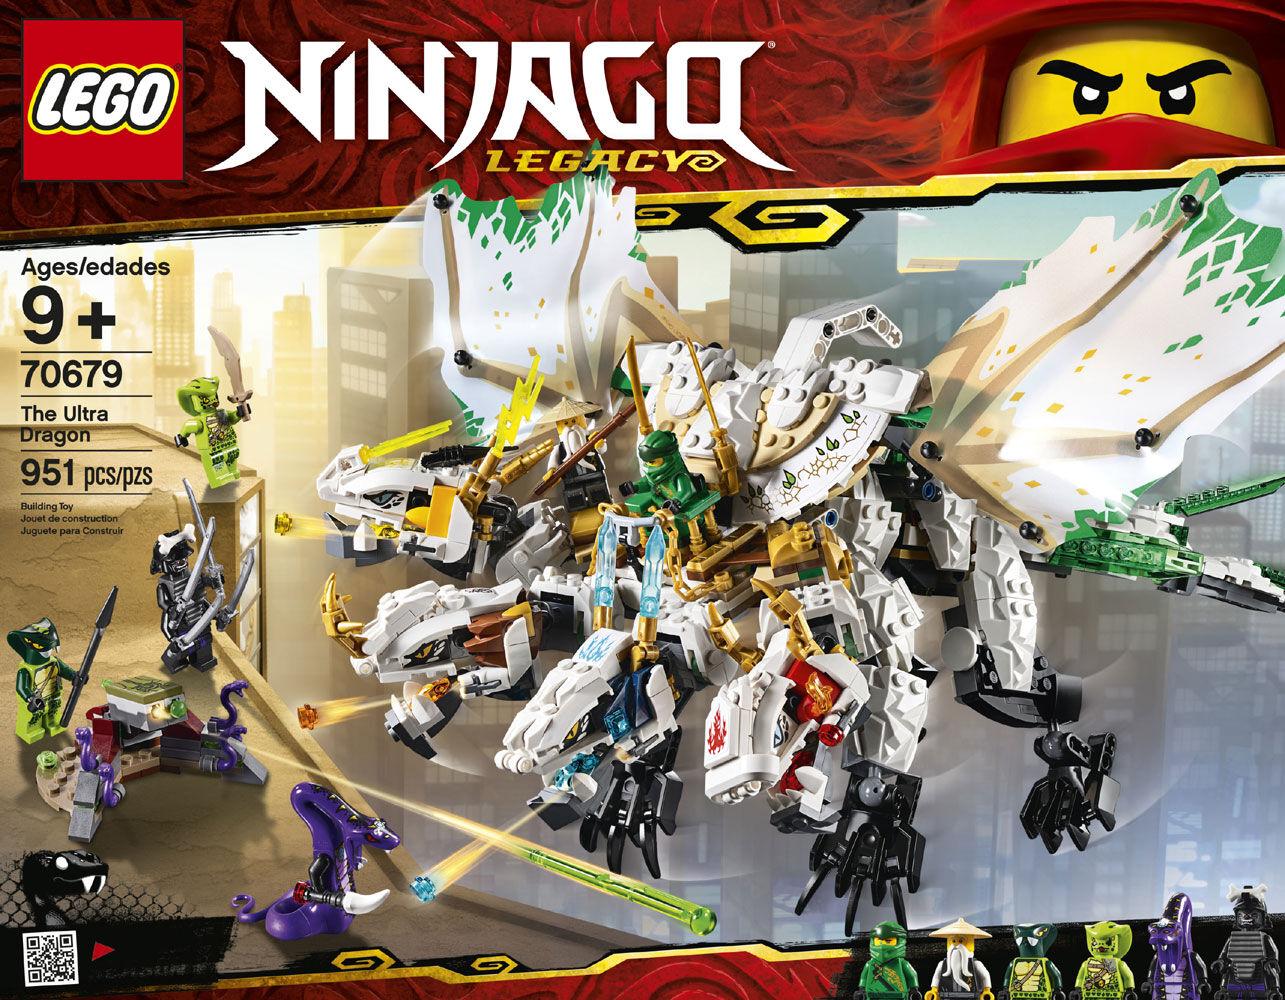 Lego Ninjago Figur Pythor aus  Set 70679